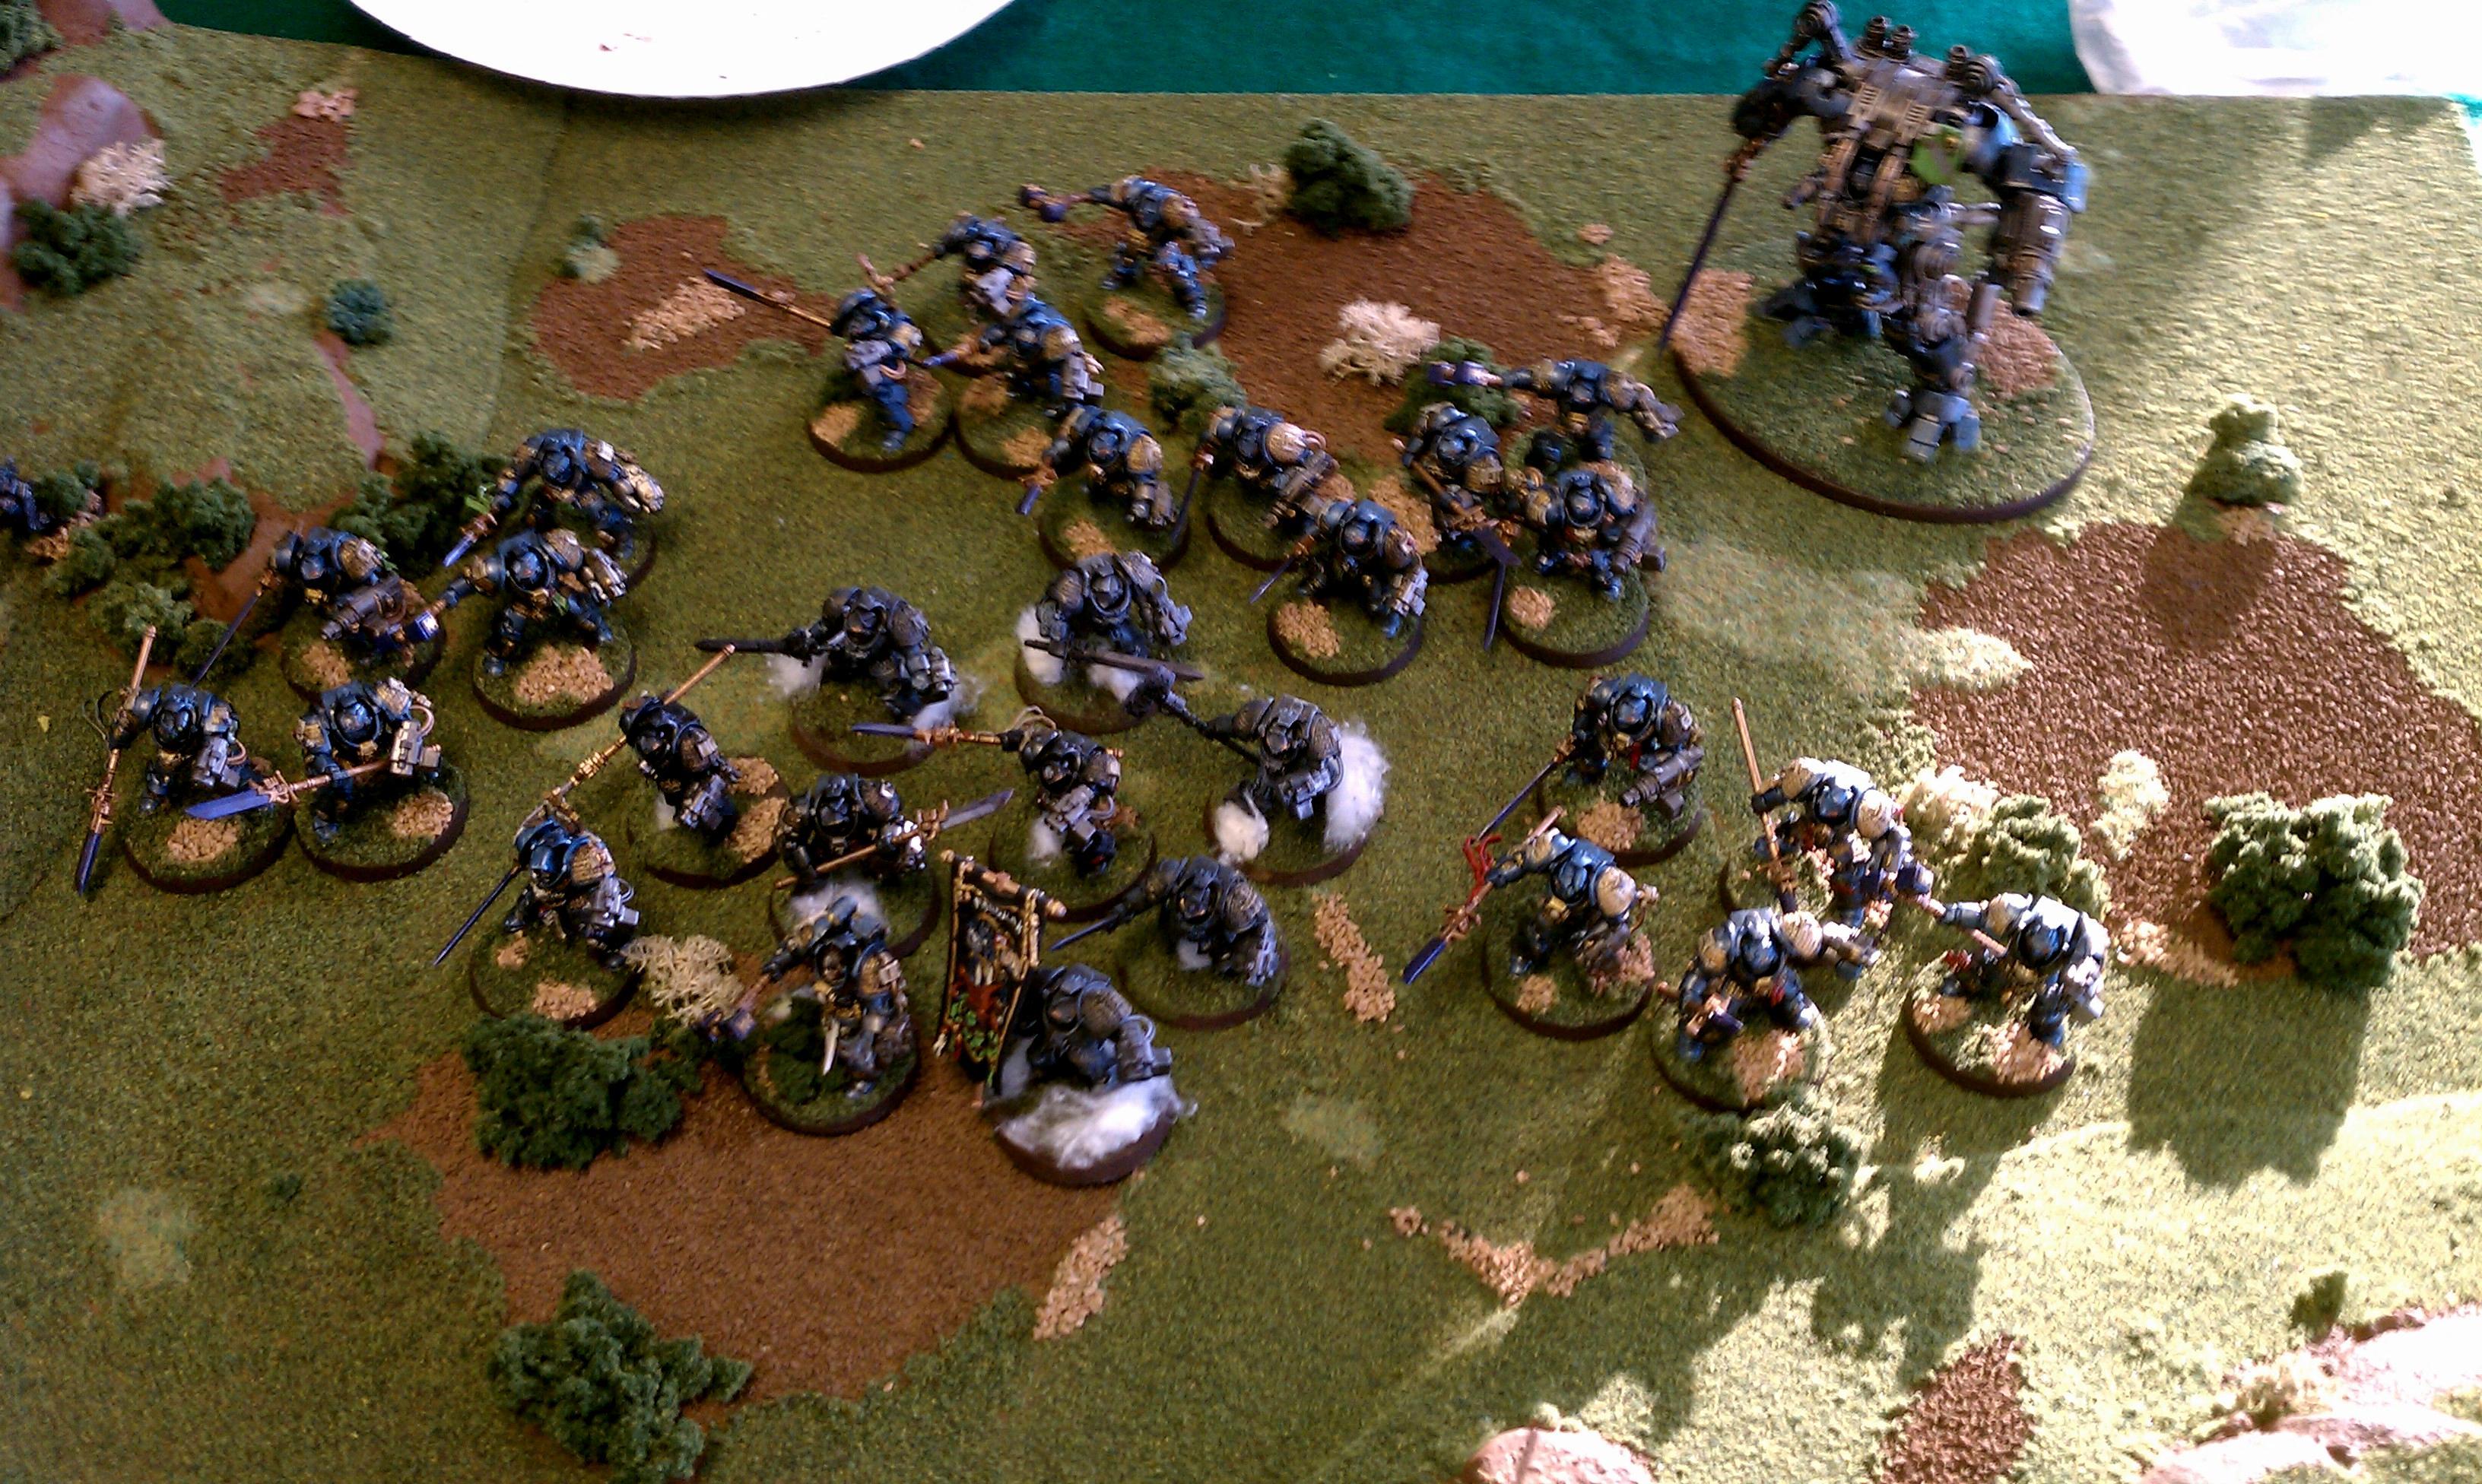 Brothers Grim, Grand Tournament